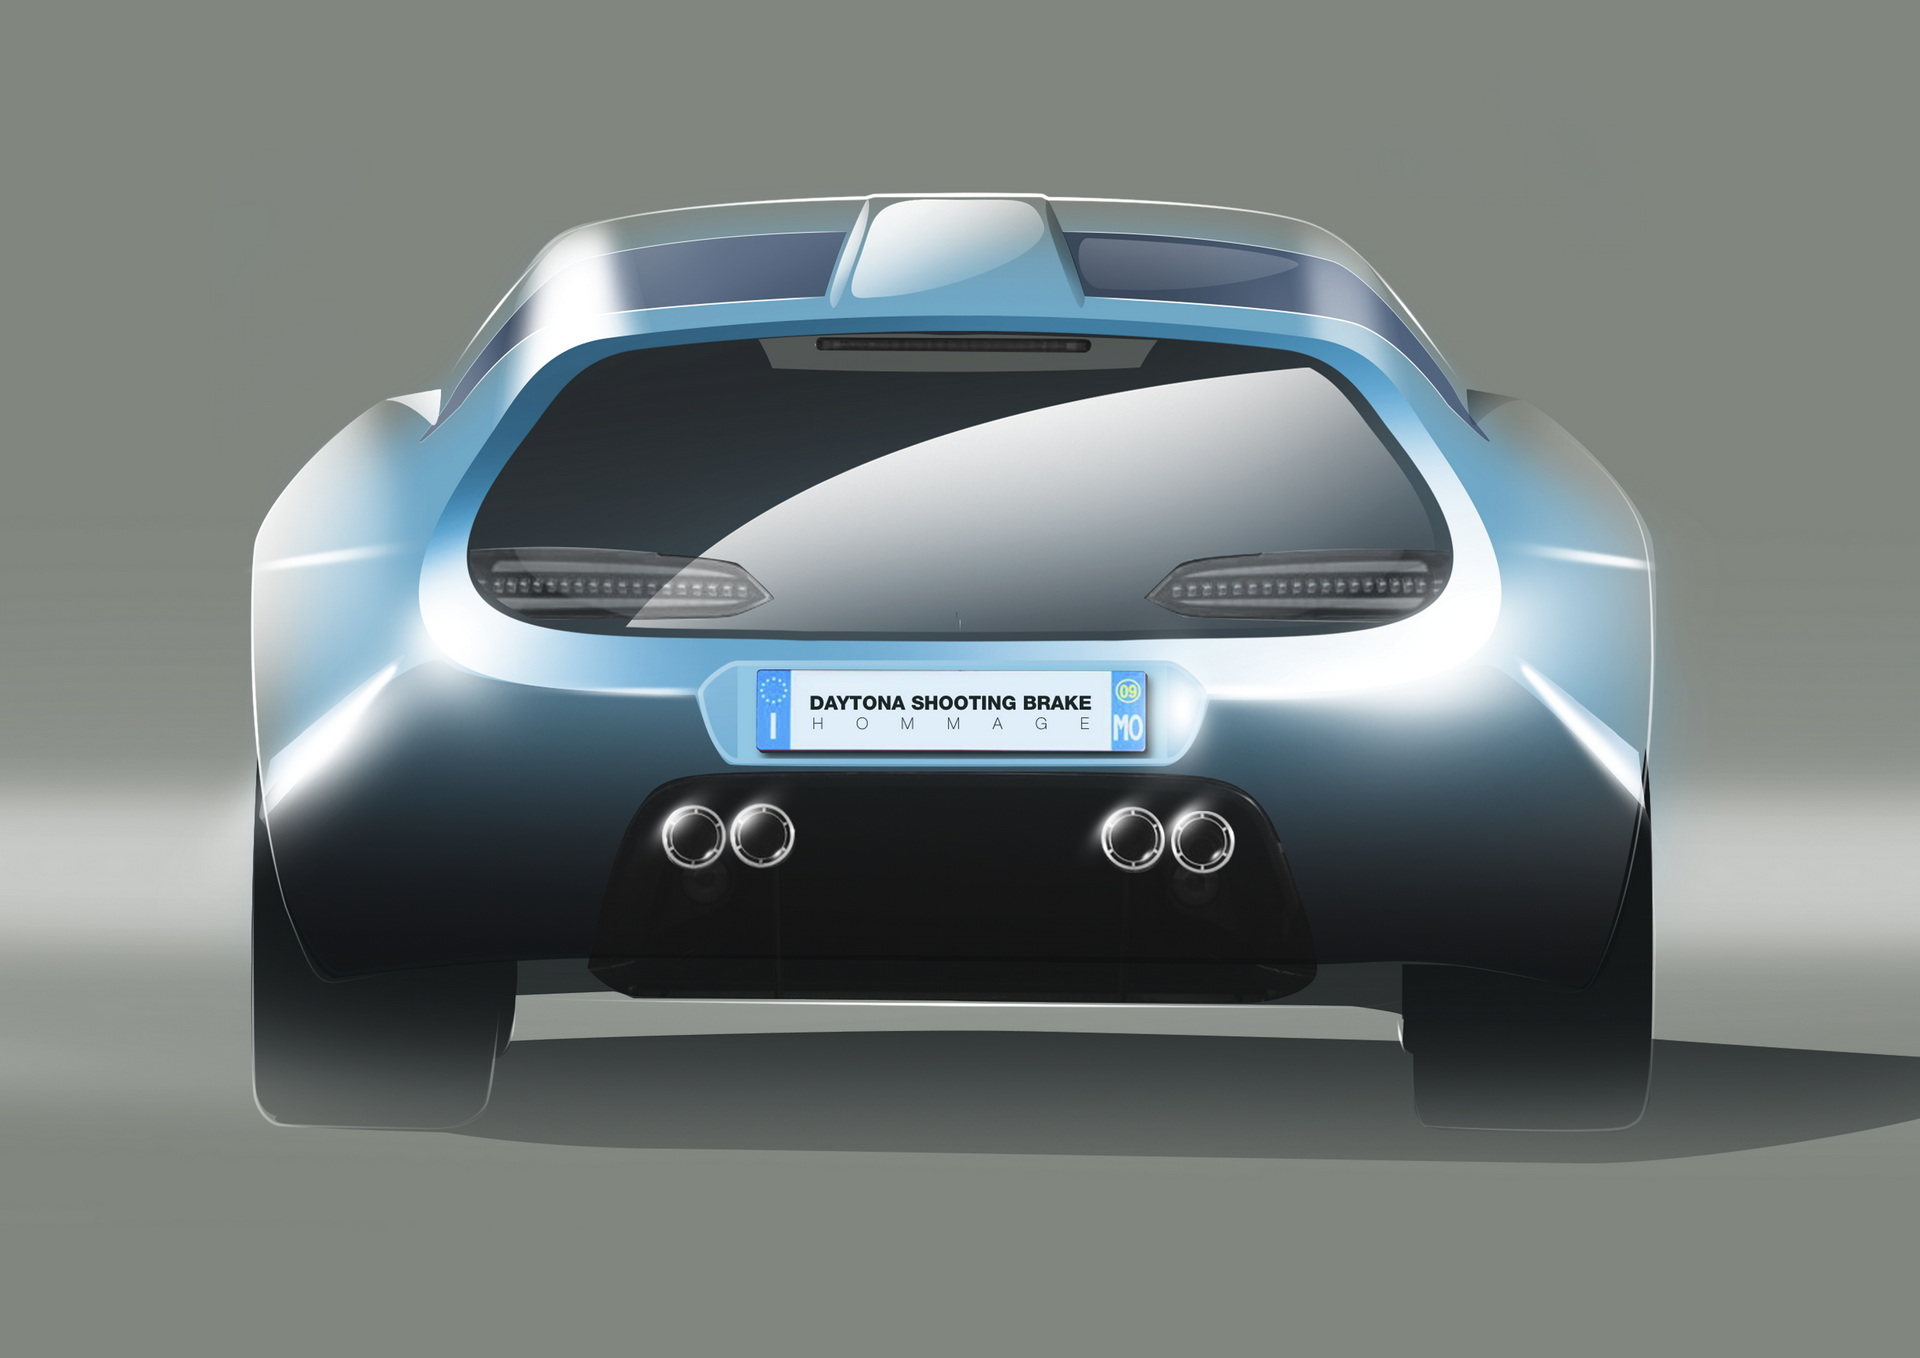 Ferrari-Daytona-Shooting-Brake-Hommage-by-Niels-van-Roij-Design-25